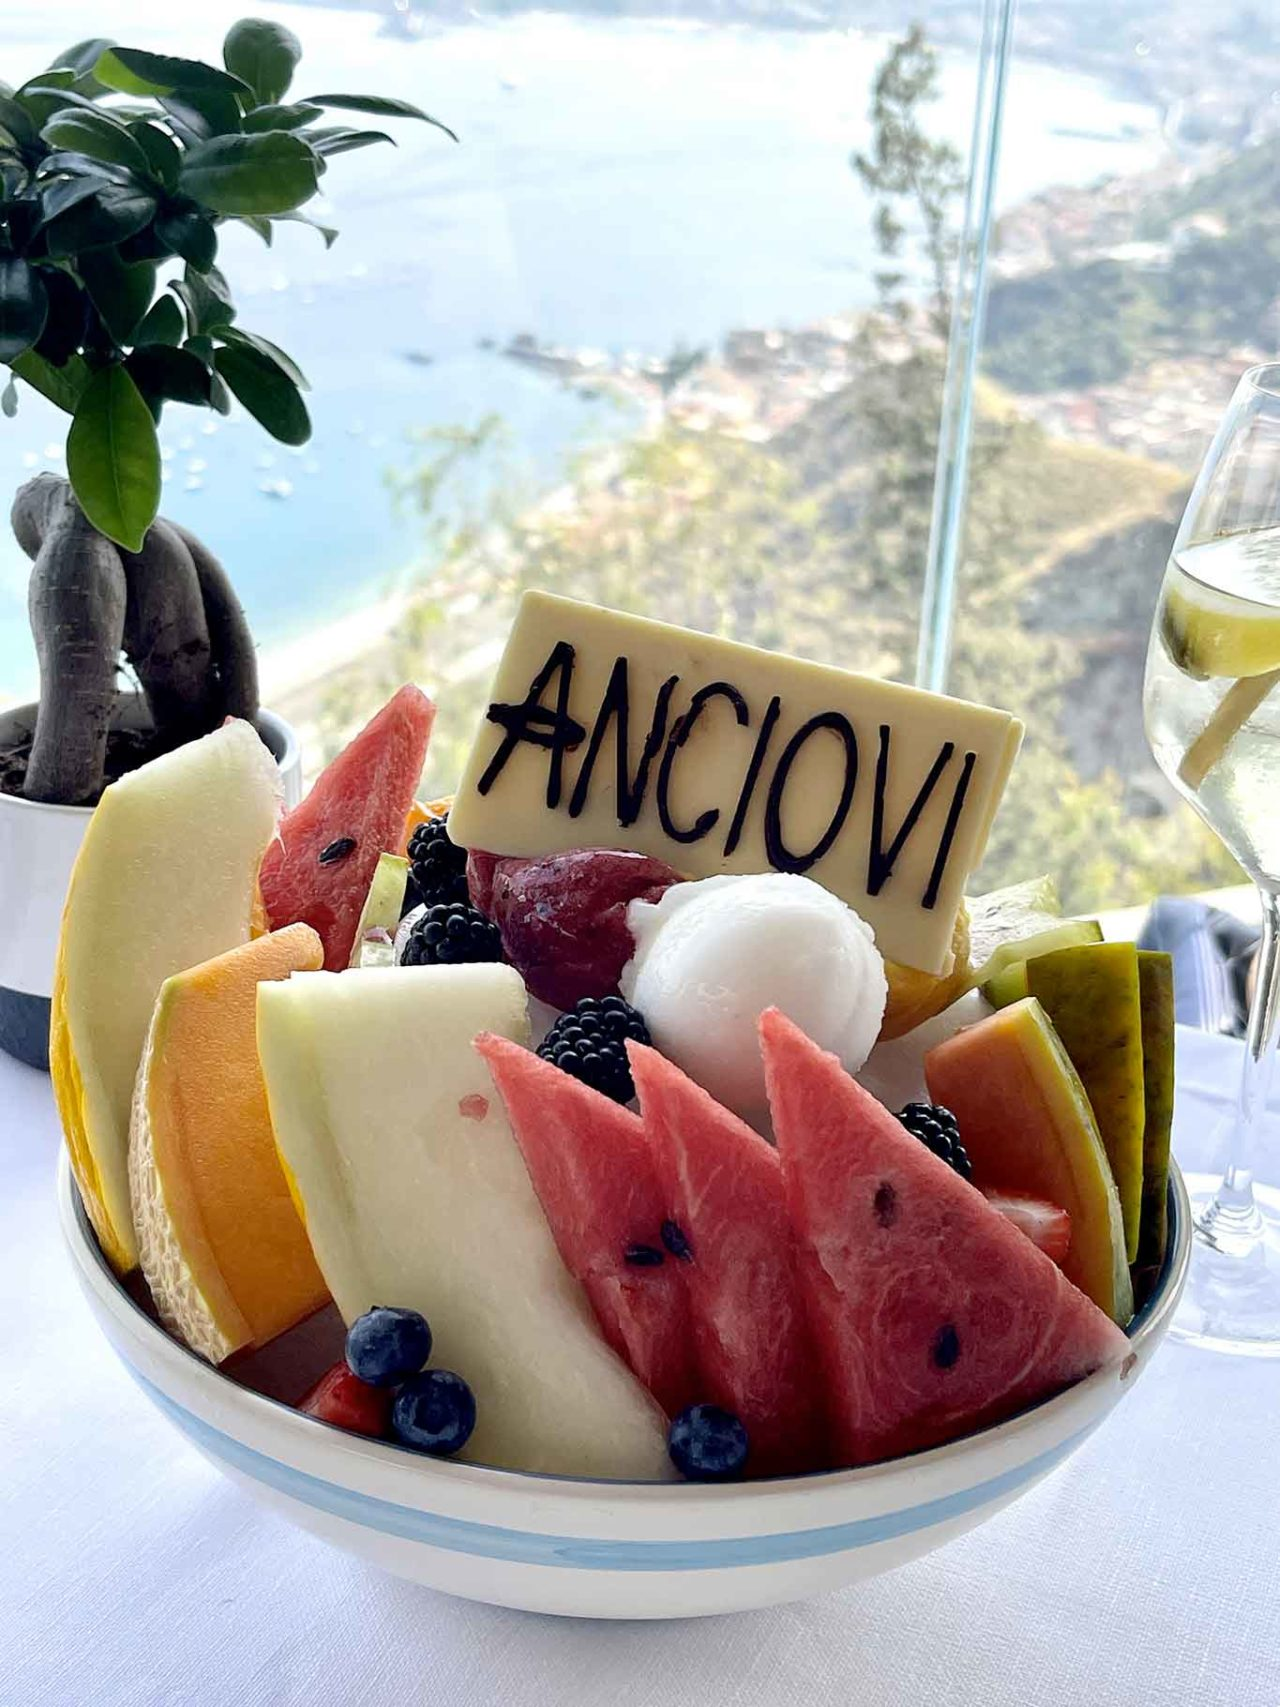 sorbetto e frutta a Taormina